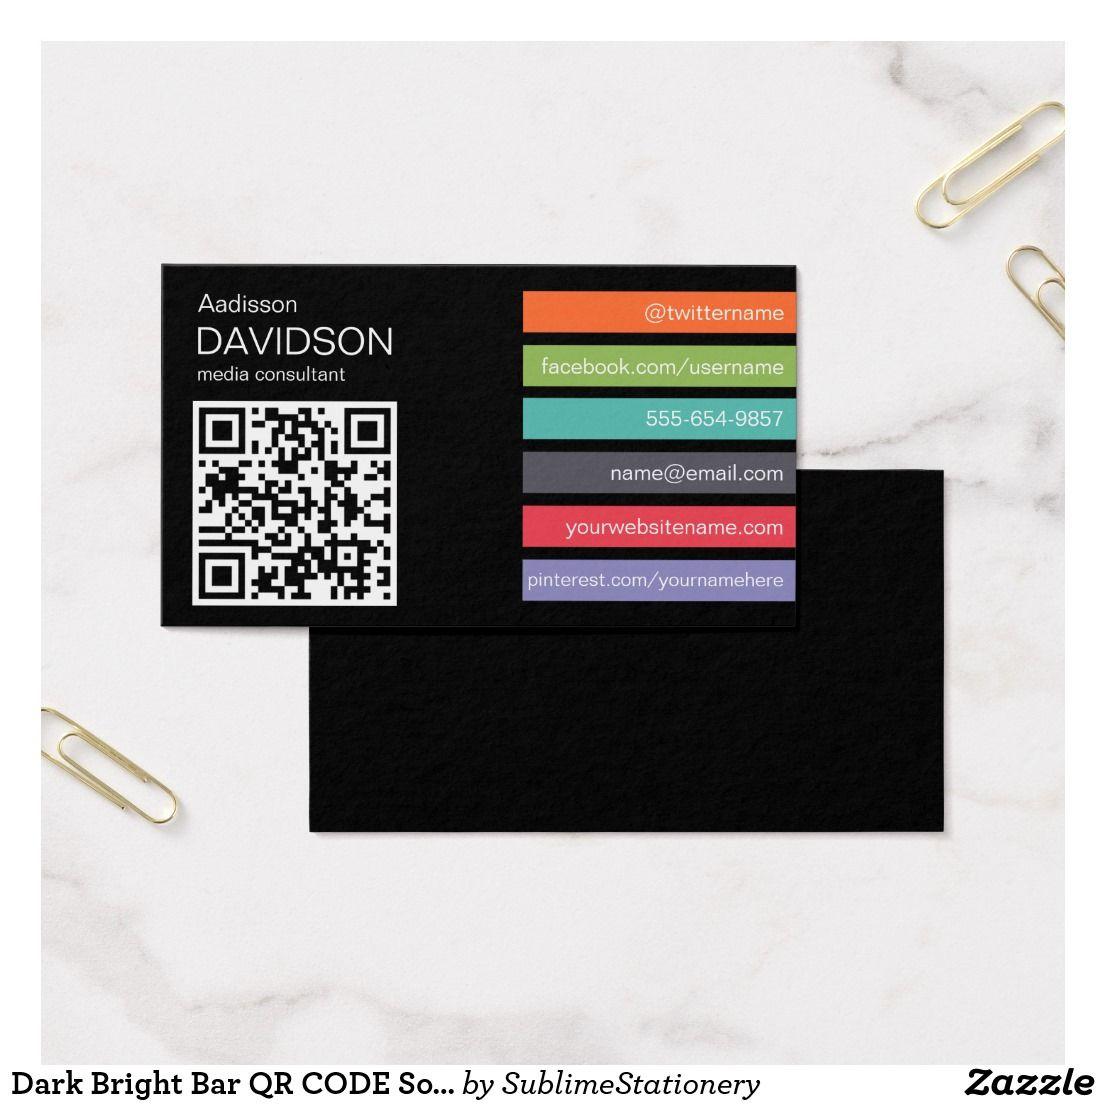 Dark Bright Bar QR CODE Social Media Business Card | Business Cards ...